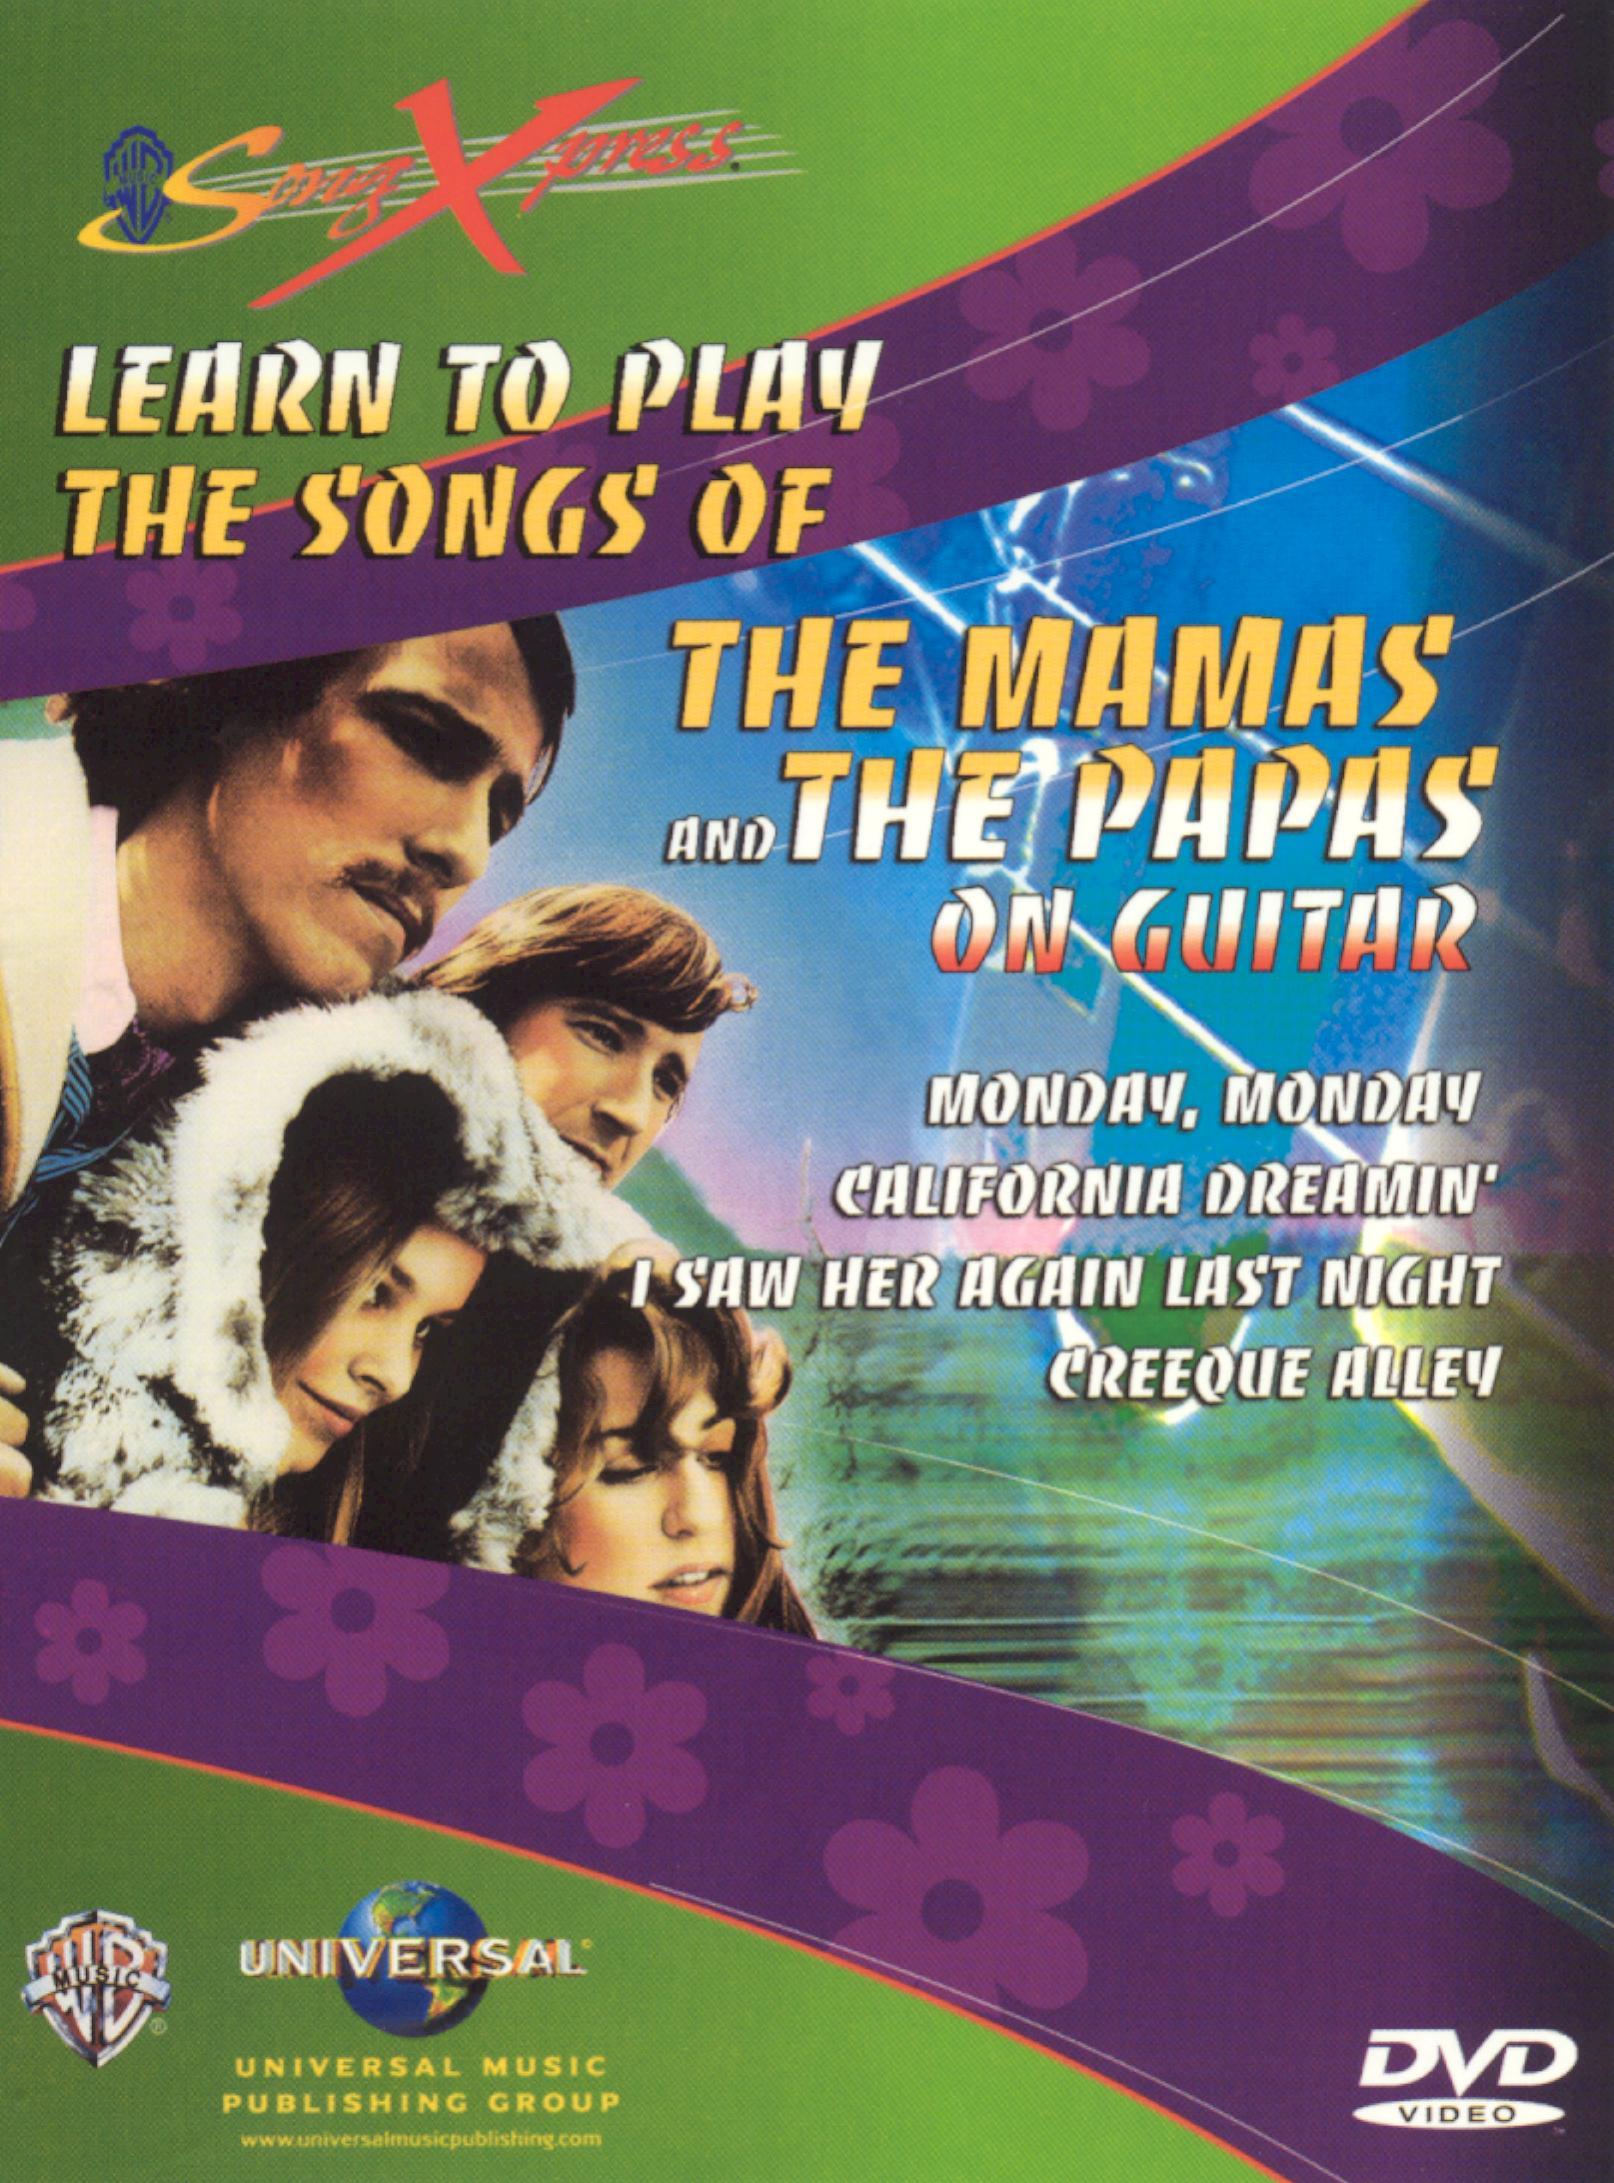 SongXpress: The Mamas & The Papas